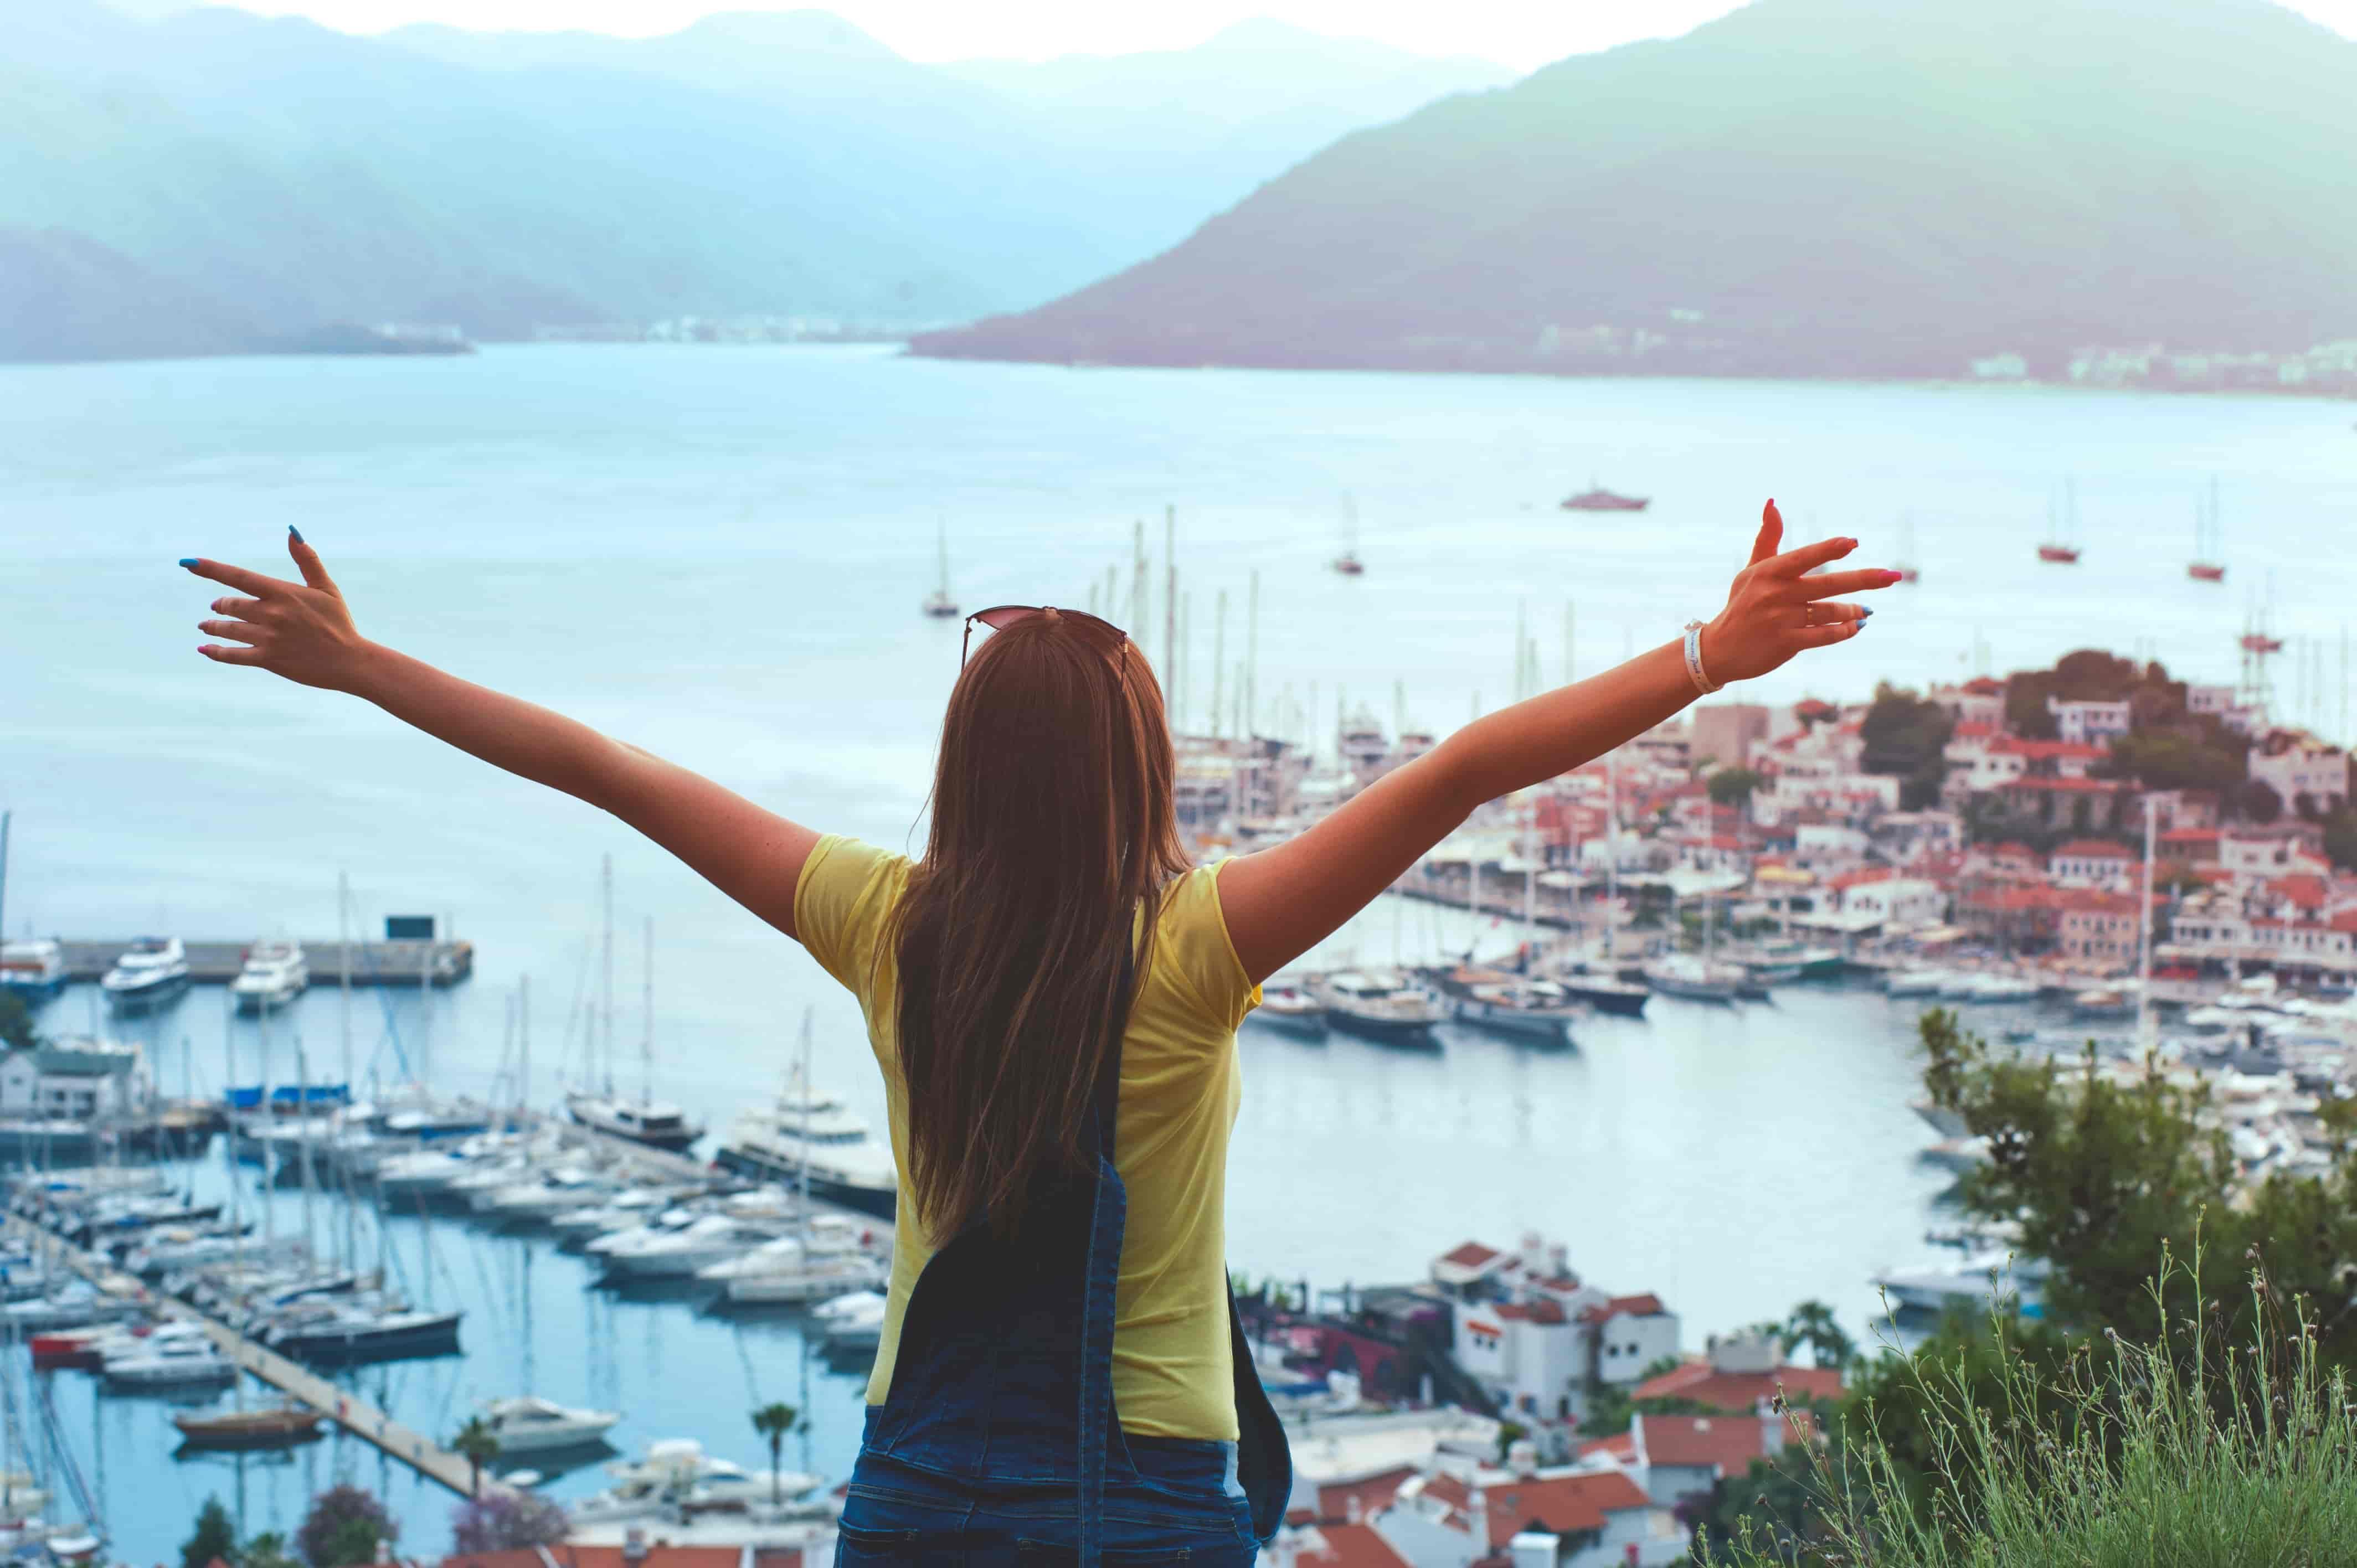 7-manfaat-traveling-yang-harus-kamu-tahu.jpg